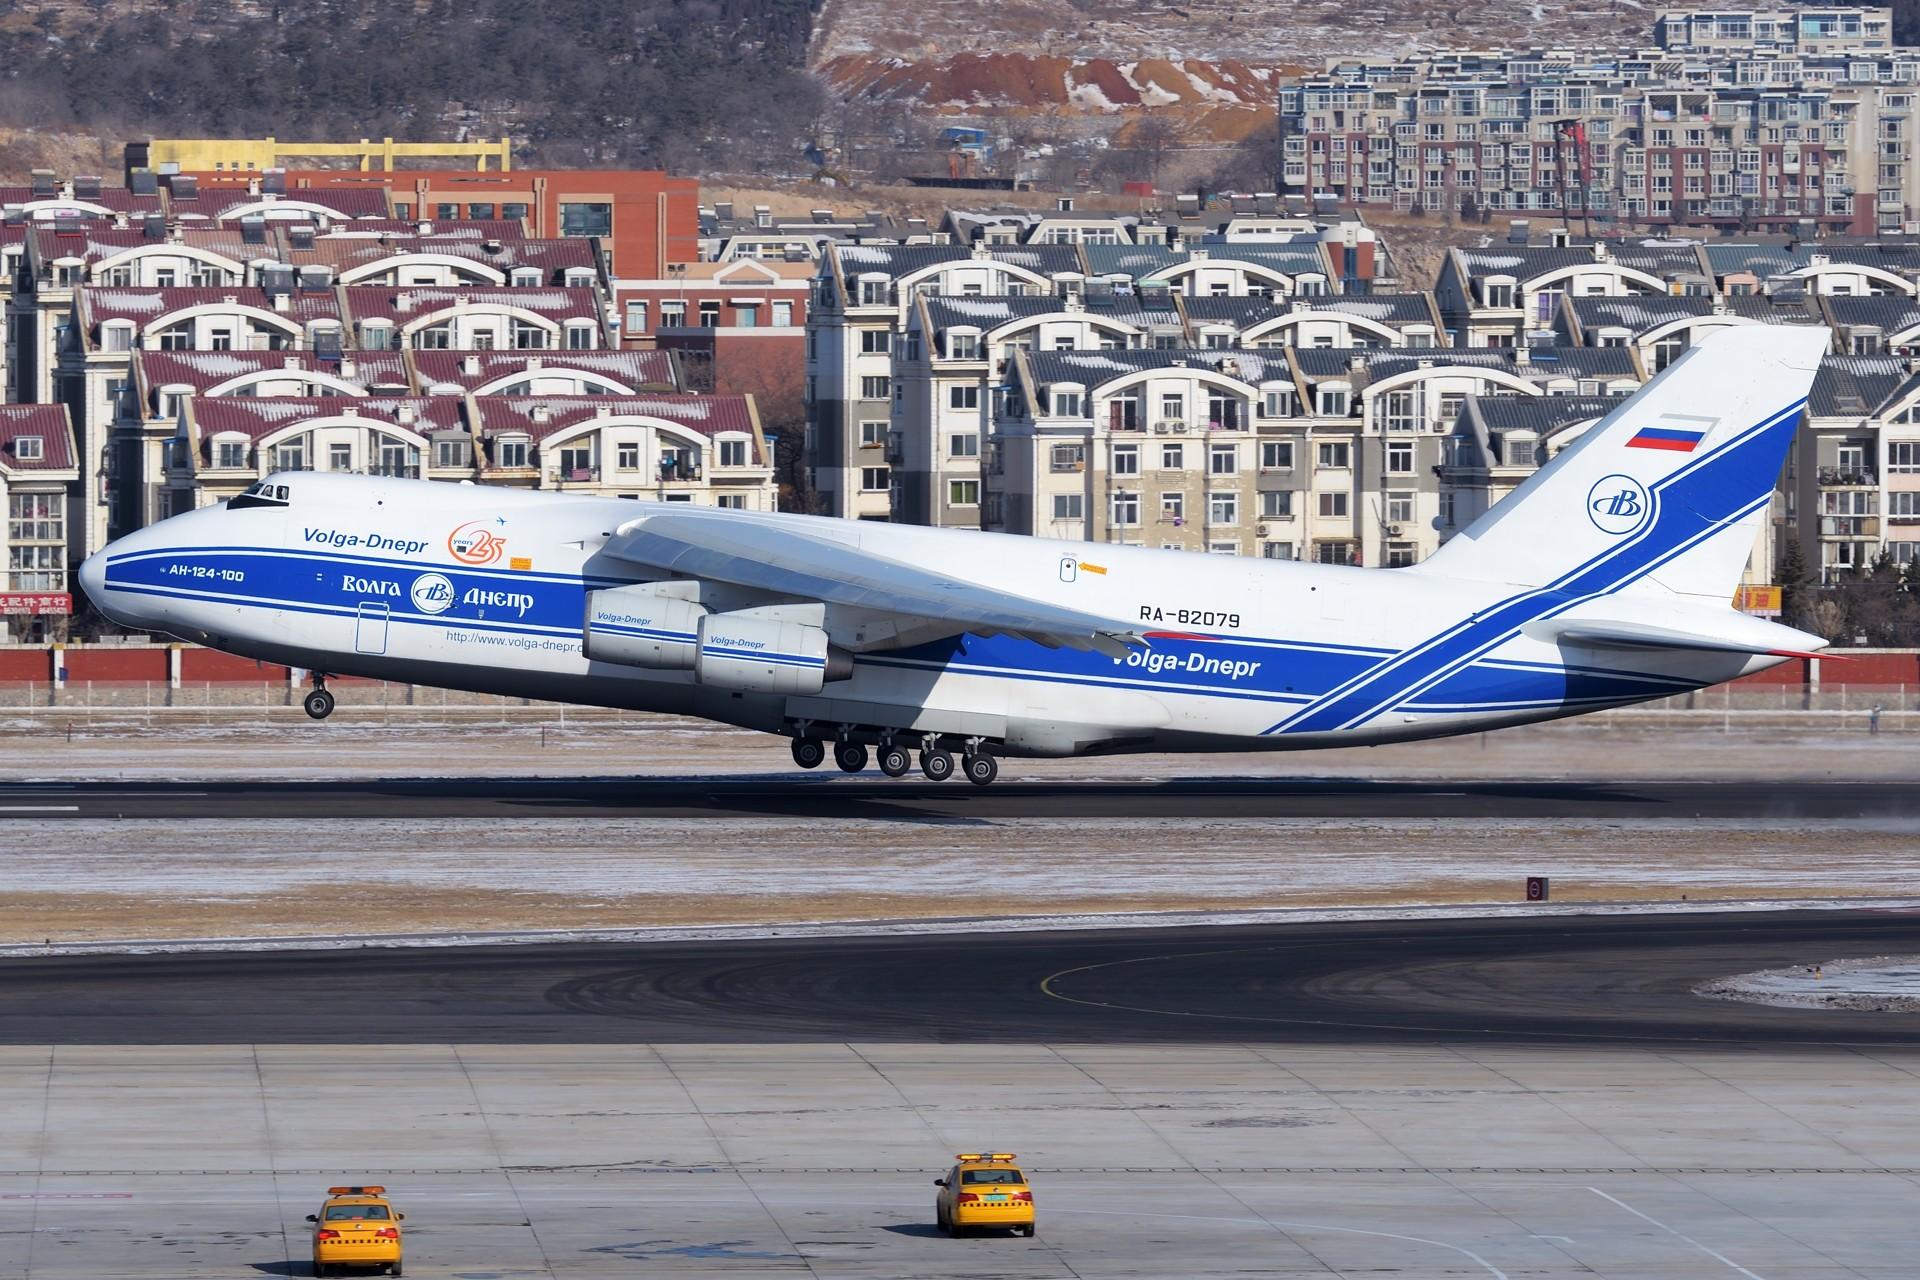 Re:[原创]★[DLC]一点有趣的事情(持续更新中)★ ANTONOV AN-124 RA-82079 中国大连国际机场